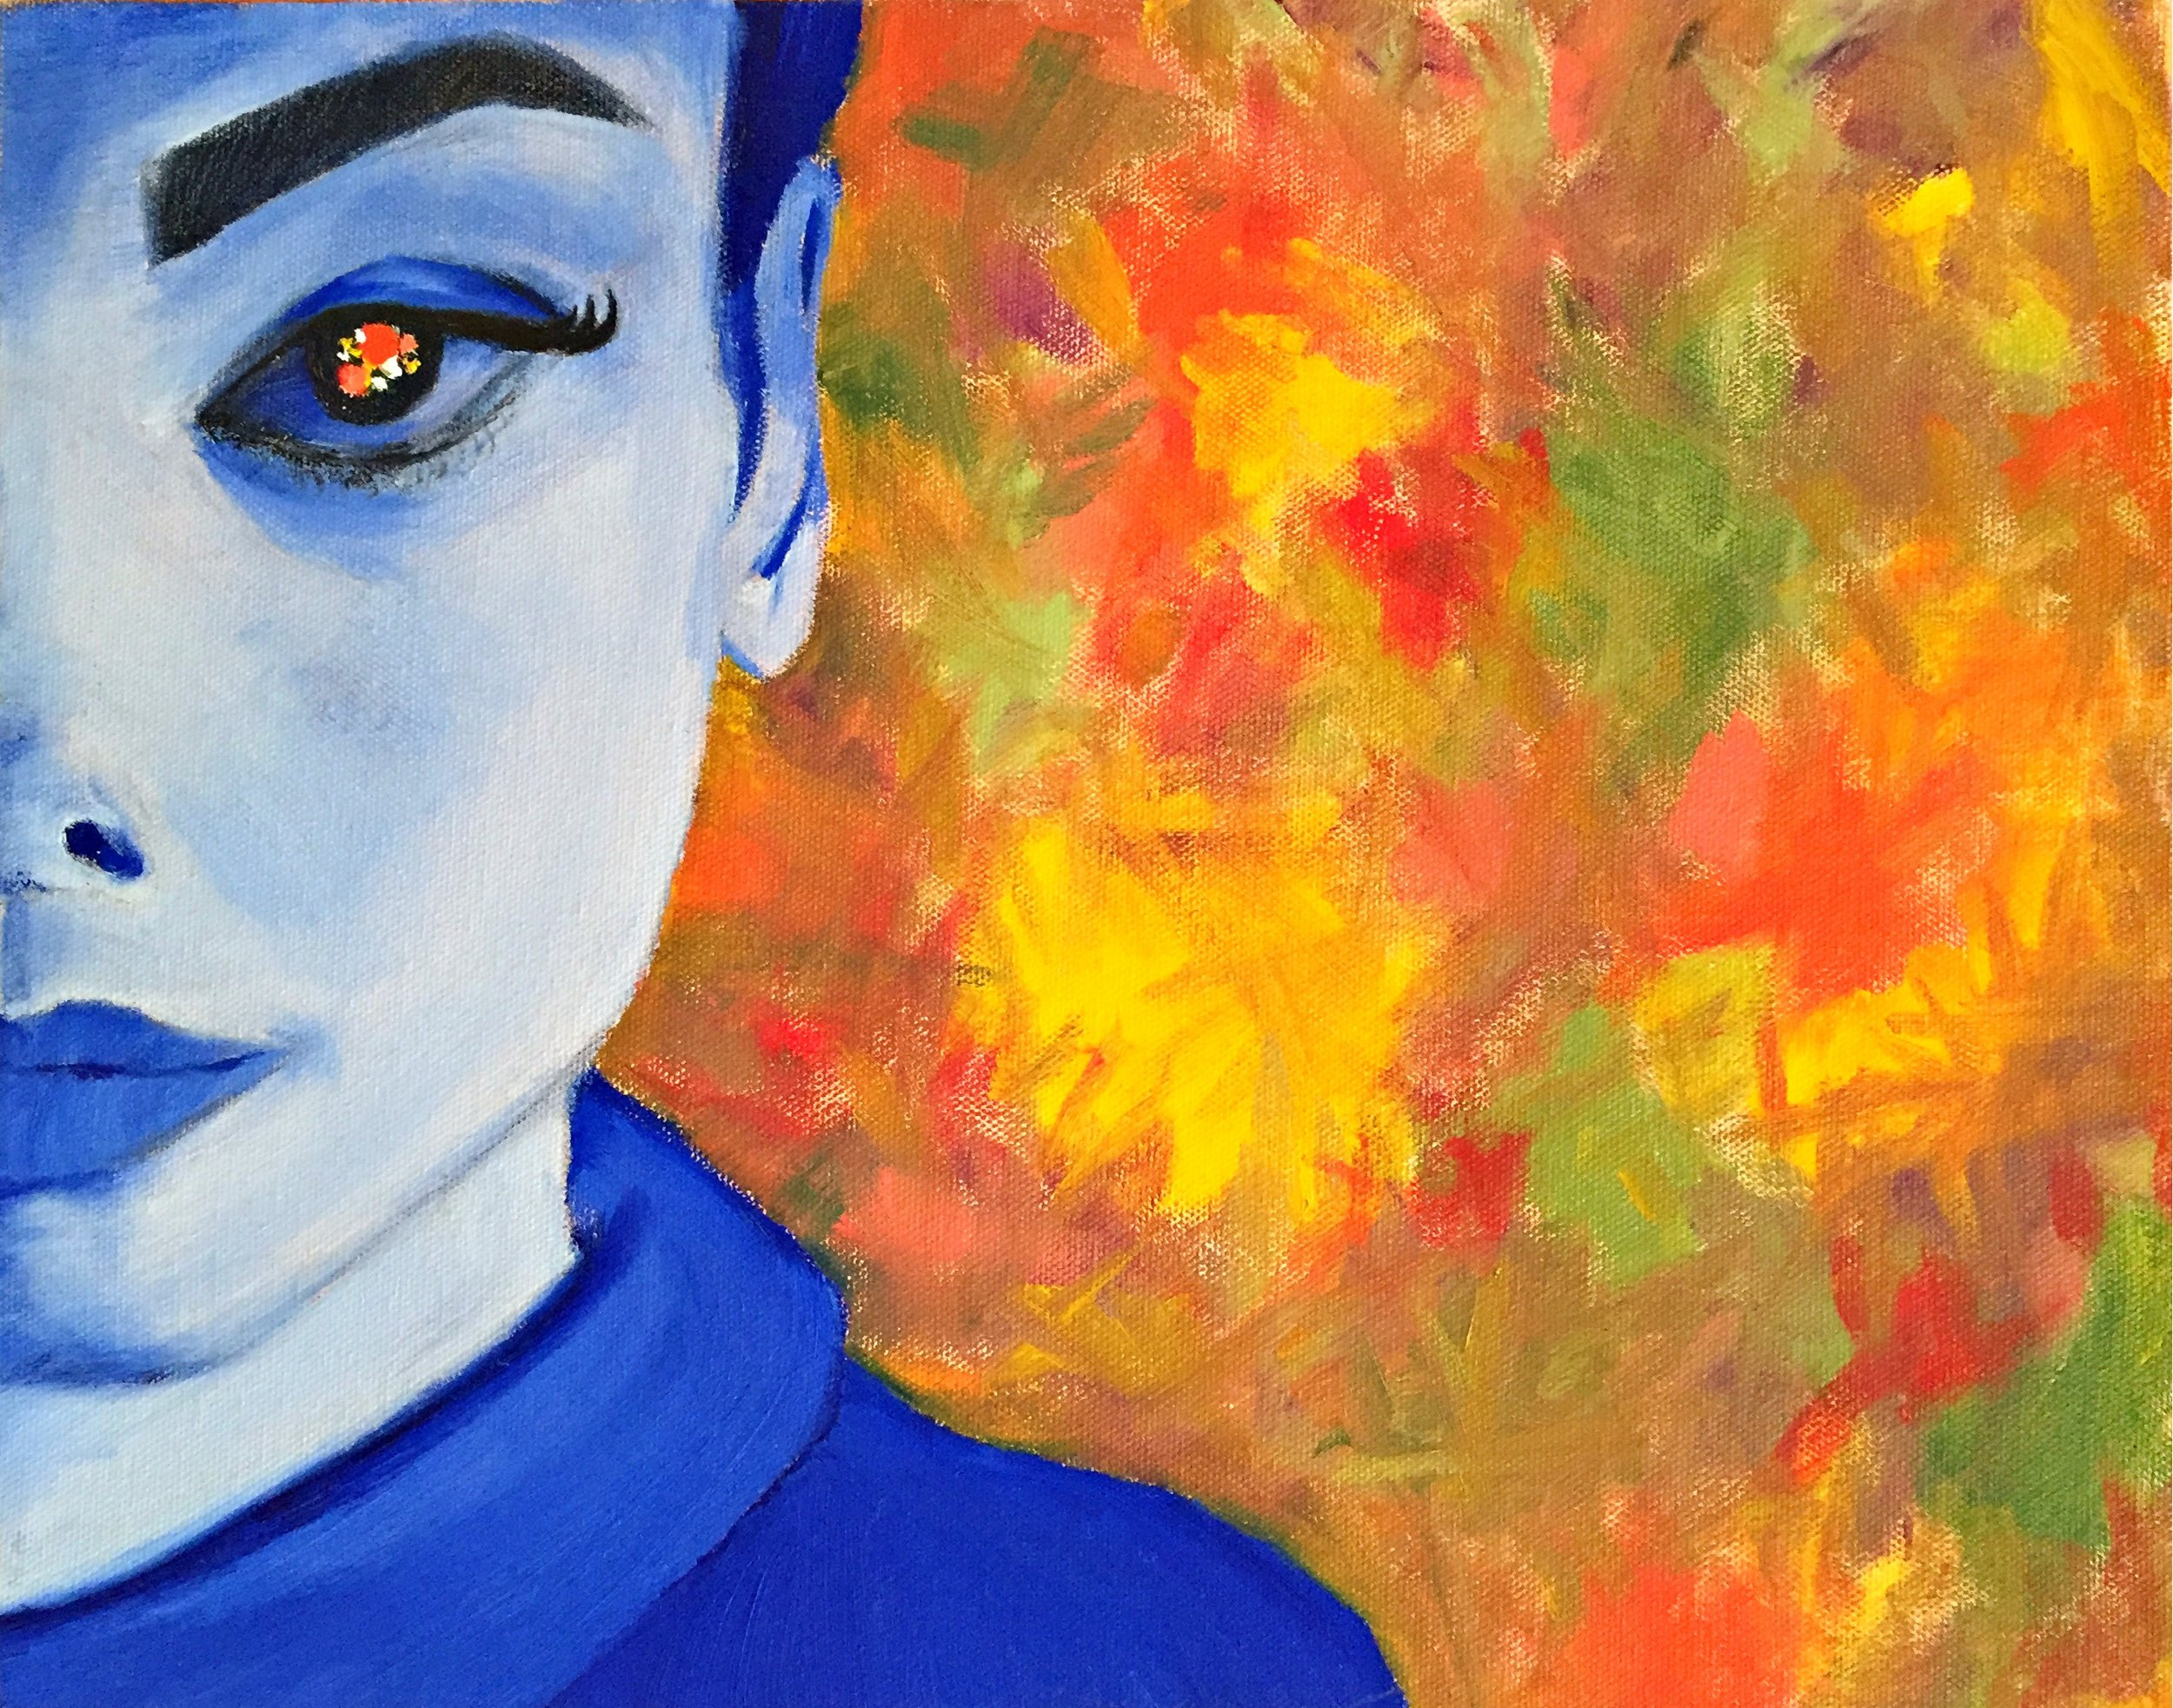 Un Arco Iris de Mujer,  Denisse Juliana Jimenez Chacon, Oil on canvas, 2017